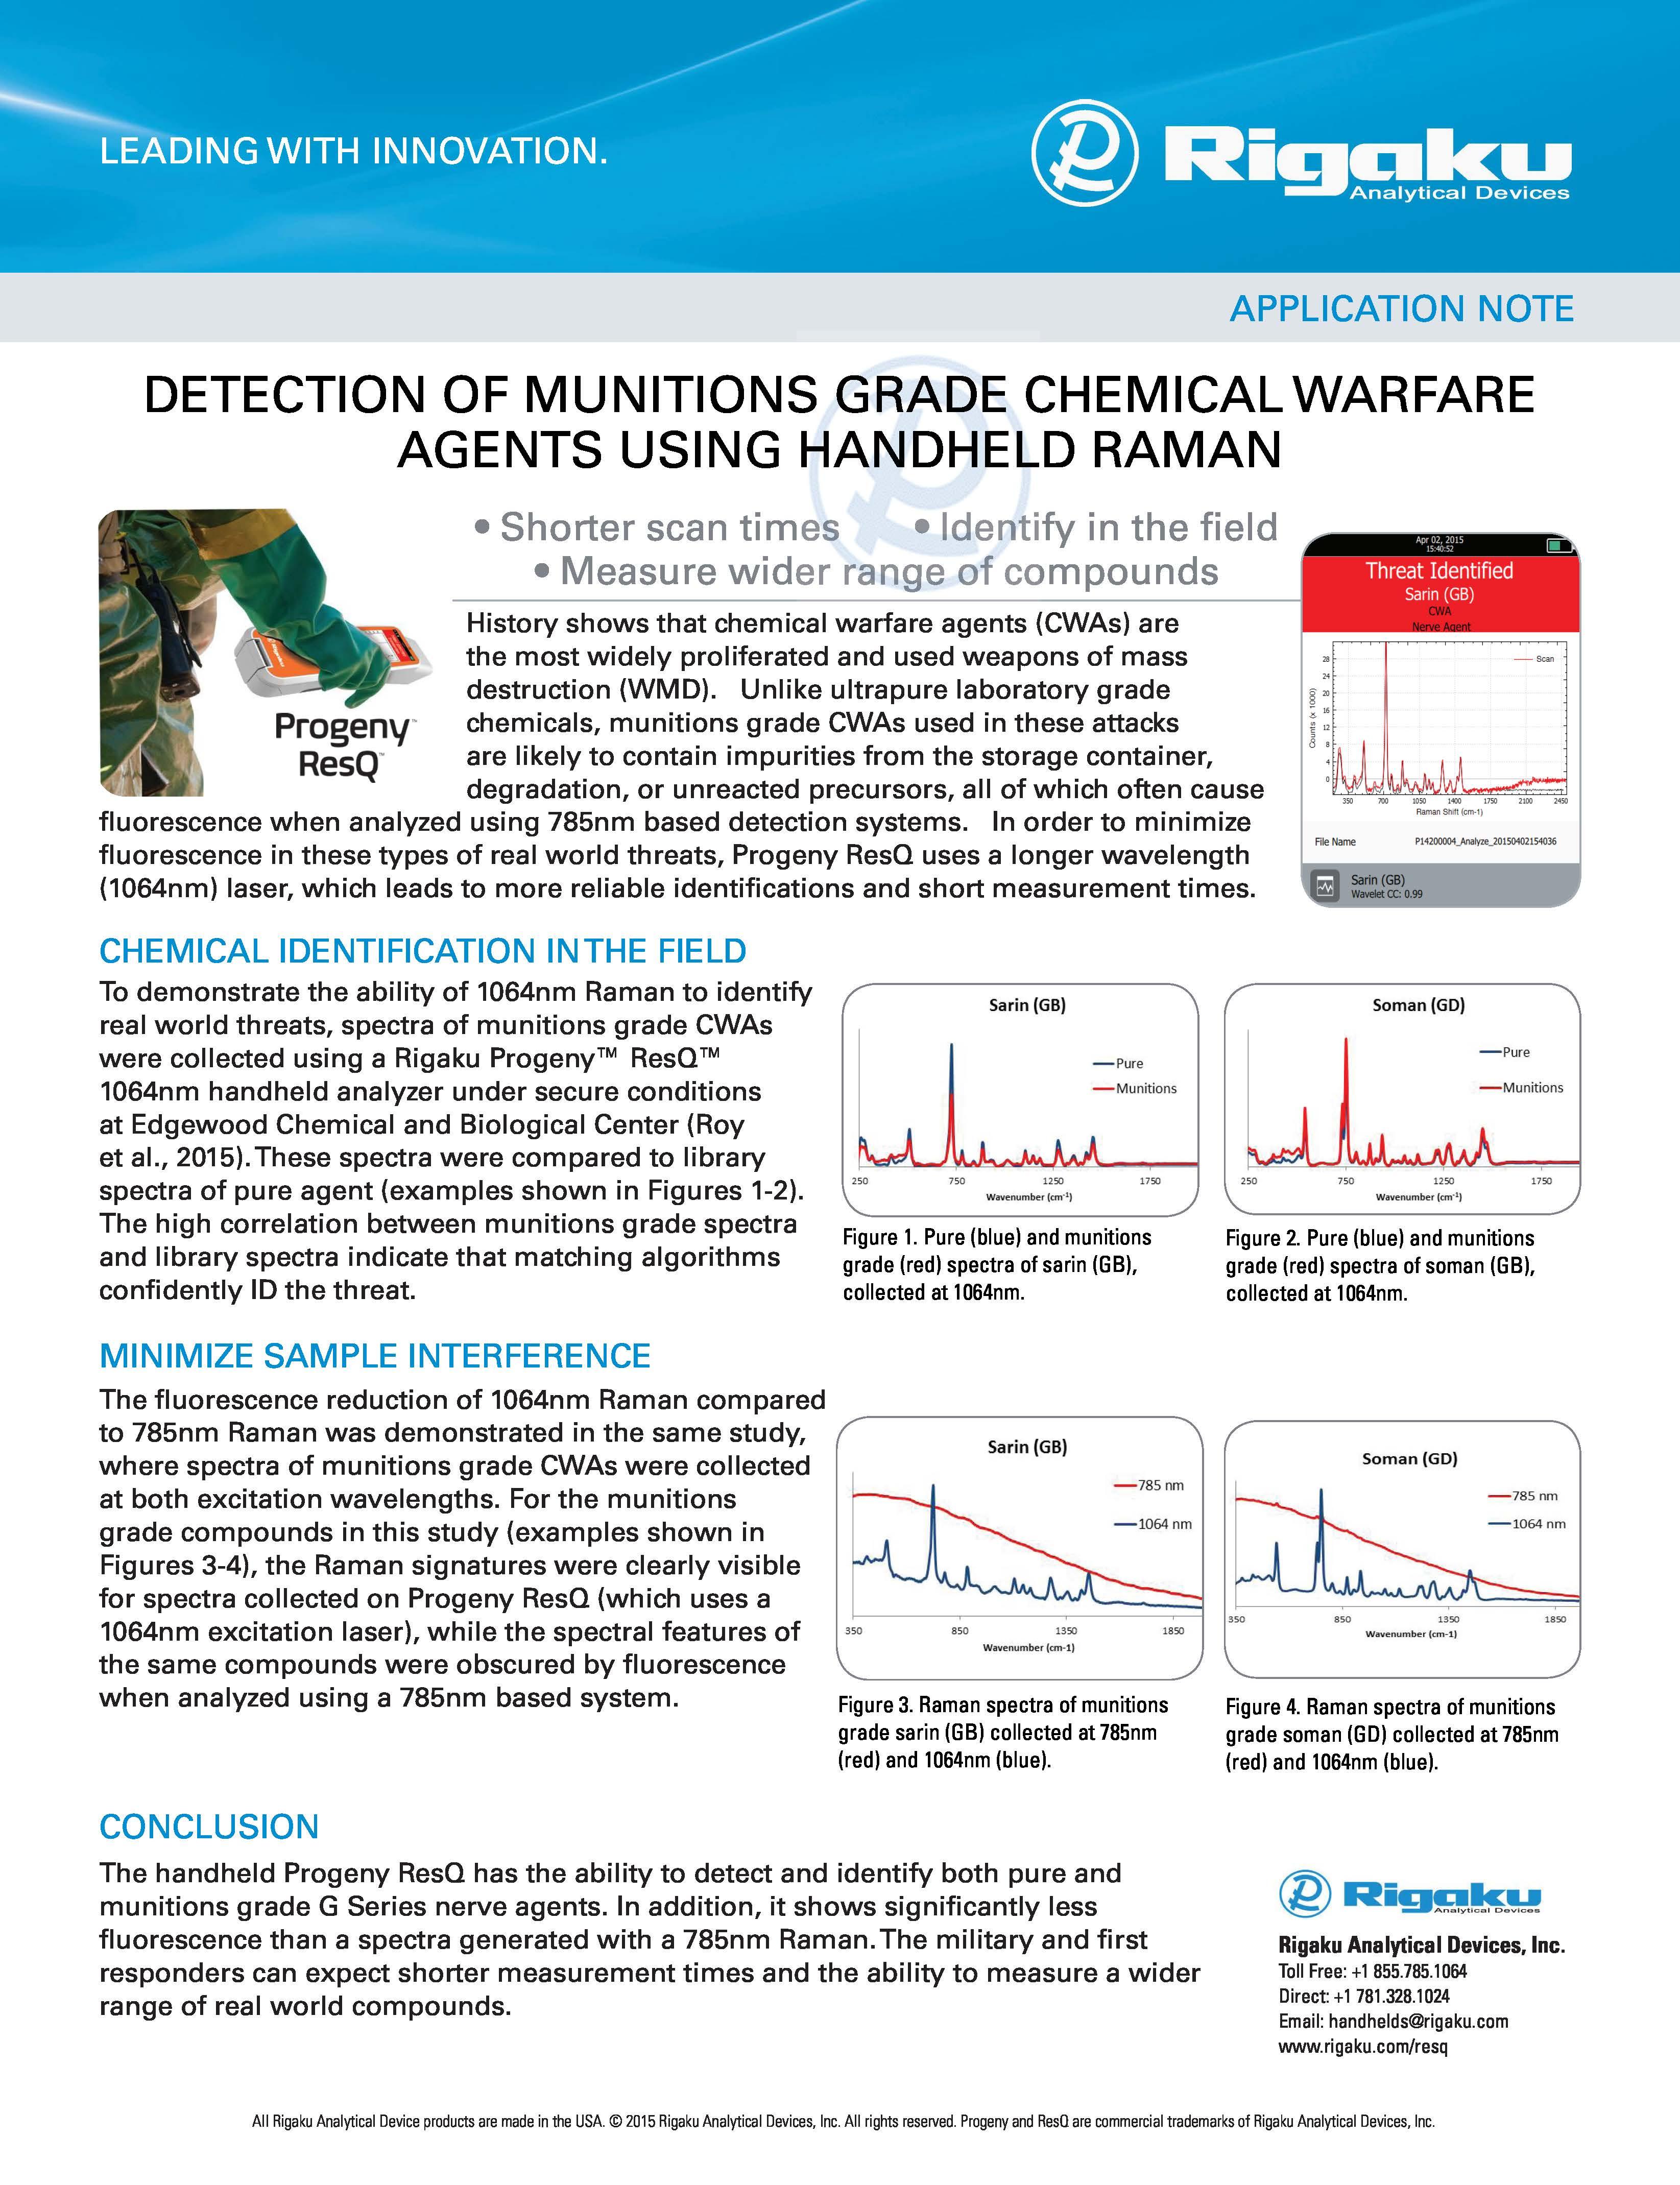 Detection of Chemical Warfar Agents App Note 2015Dec07